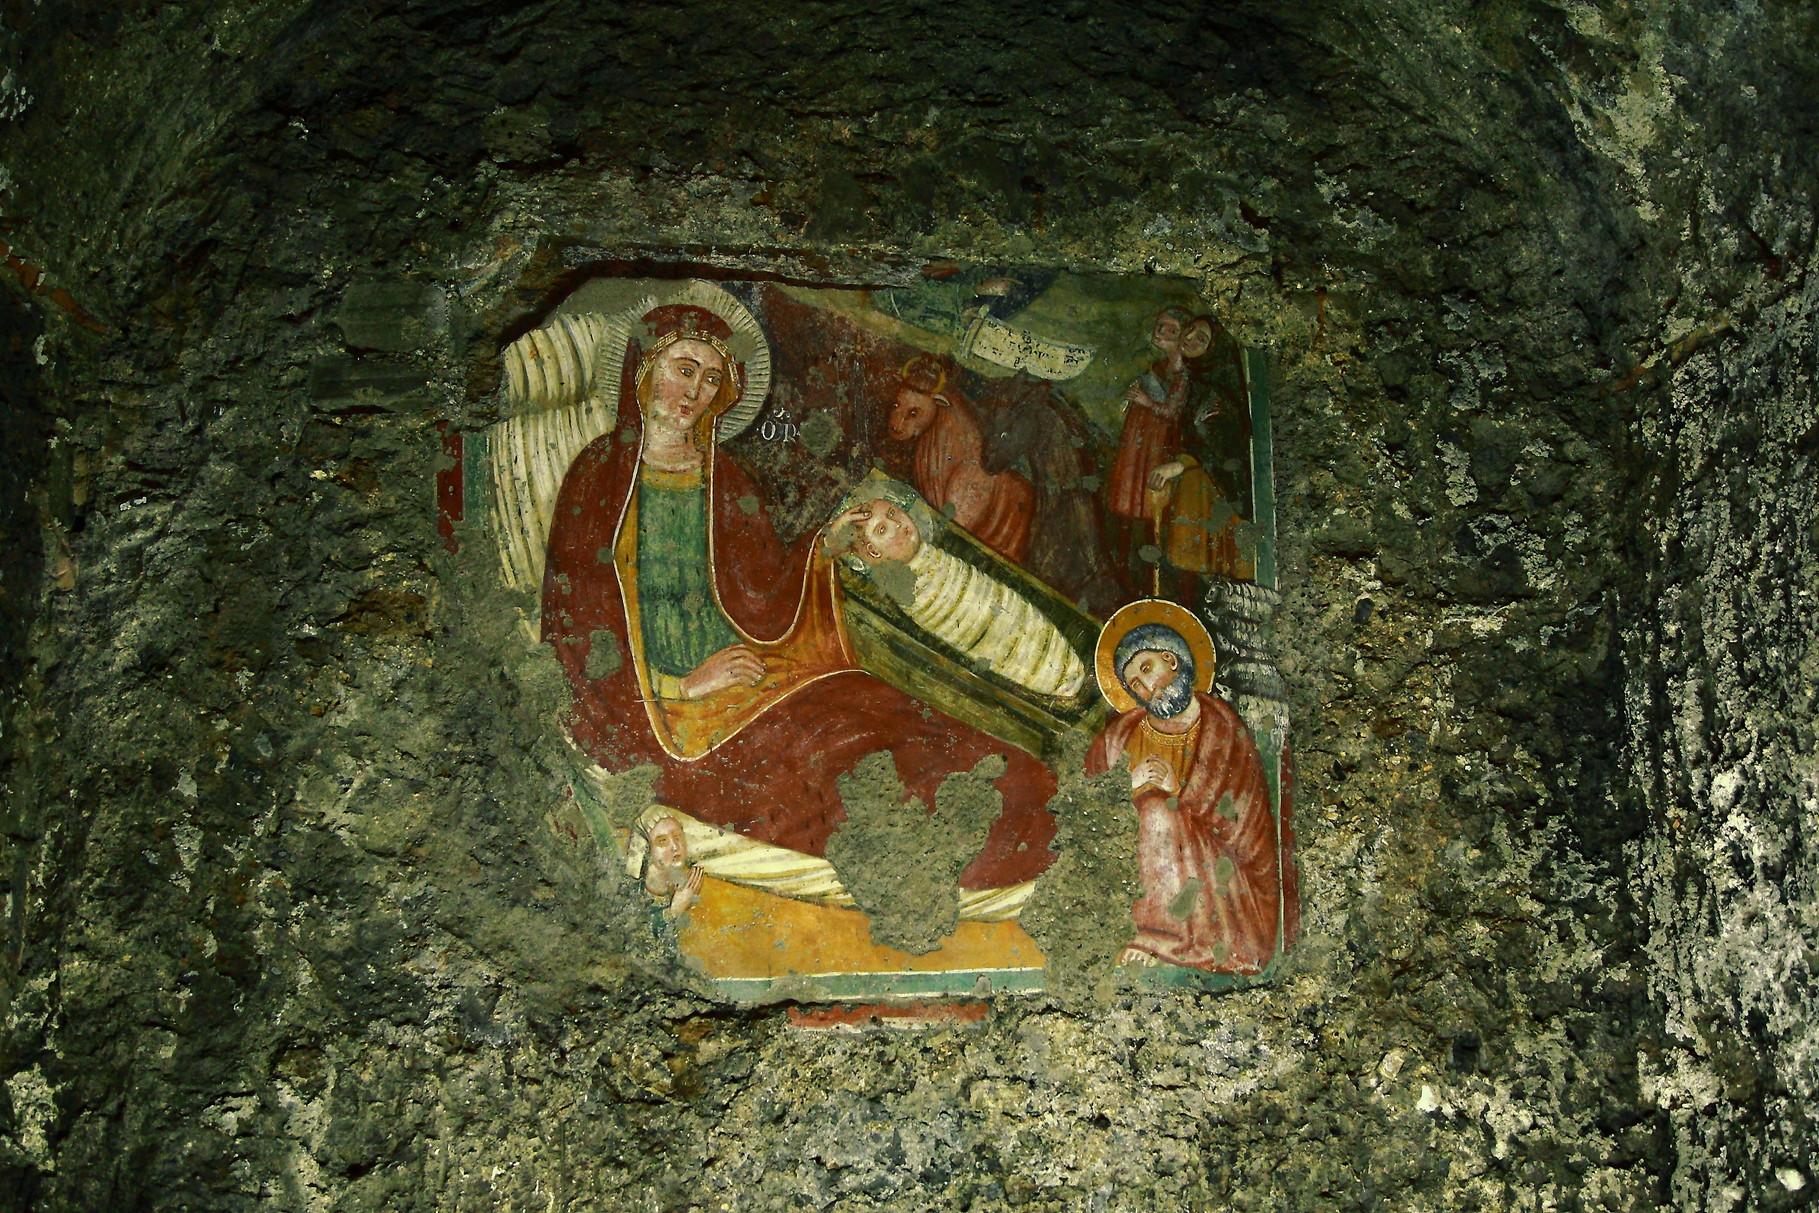 Sutri-Mitreo